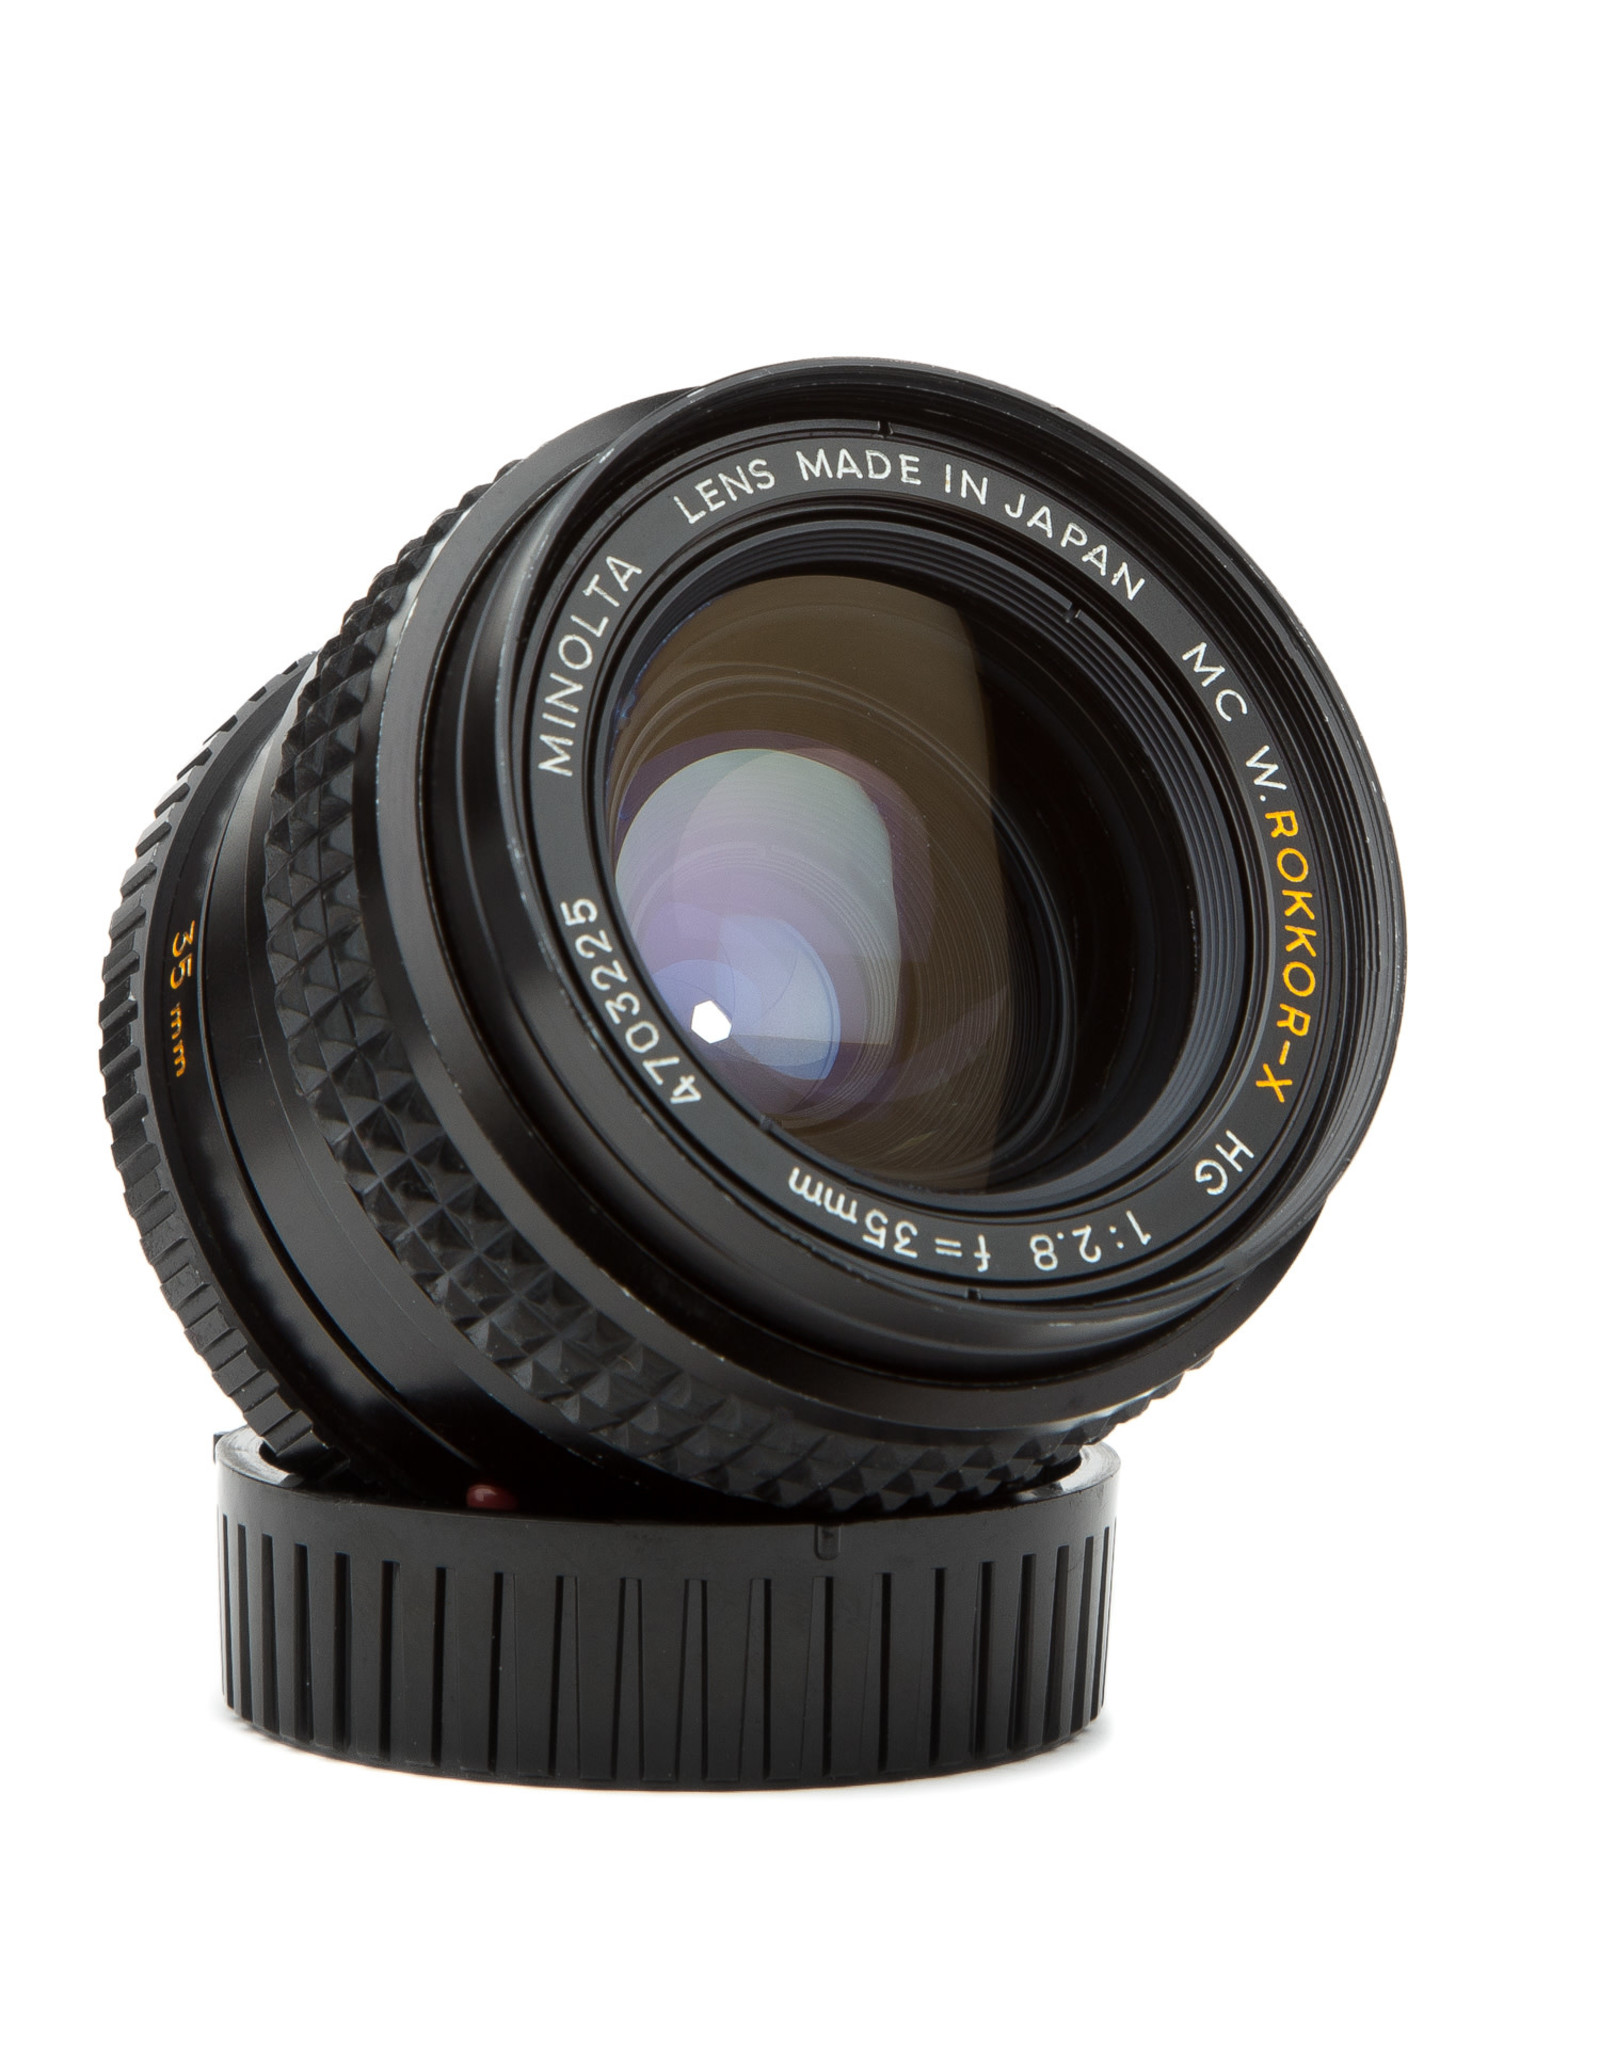 Minolta Minolta MC W Rokkor-X HG 35mm f2.8 Lens